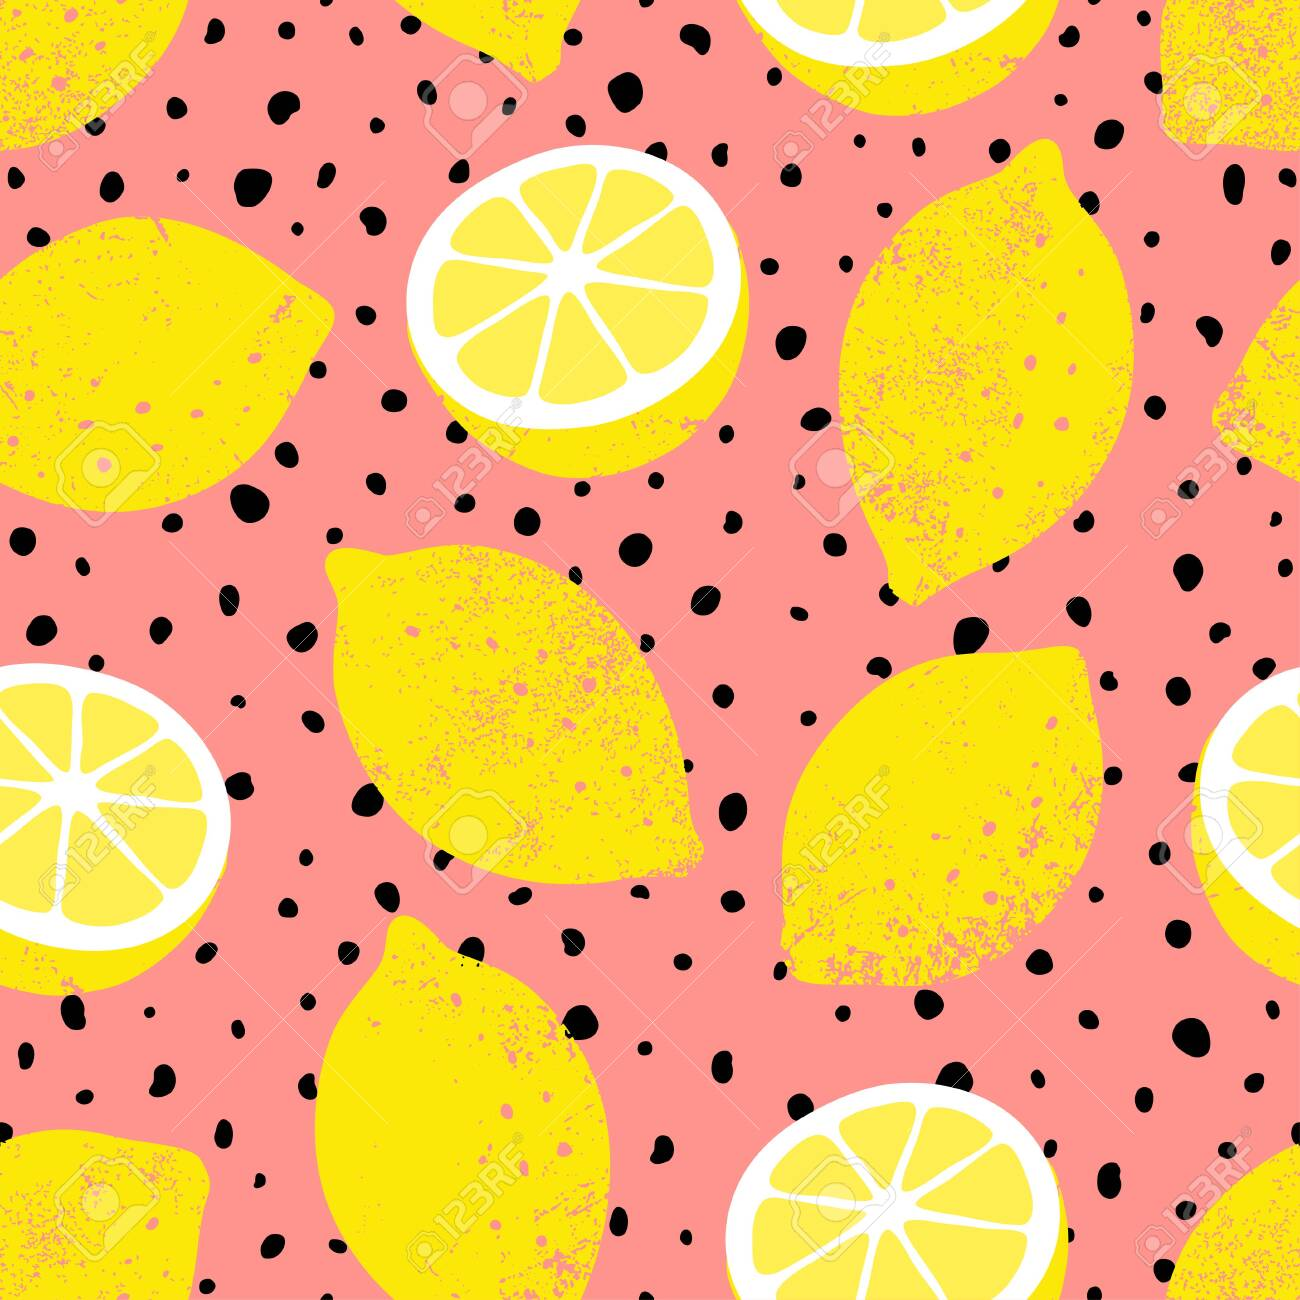 Hand Drawn Seamless Lemon Pattern With Black Dots Trendy Summer